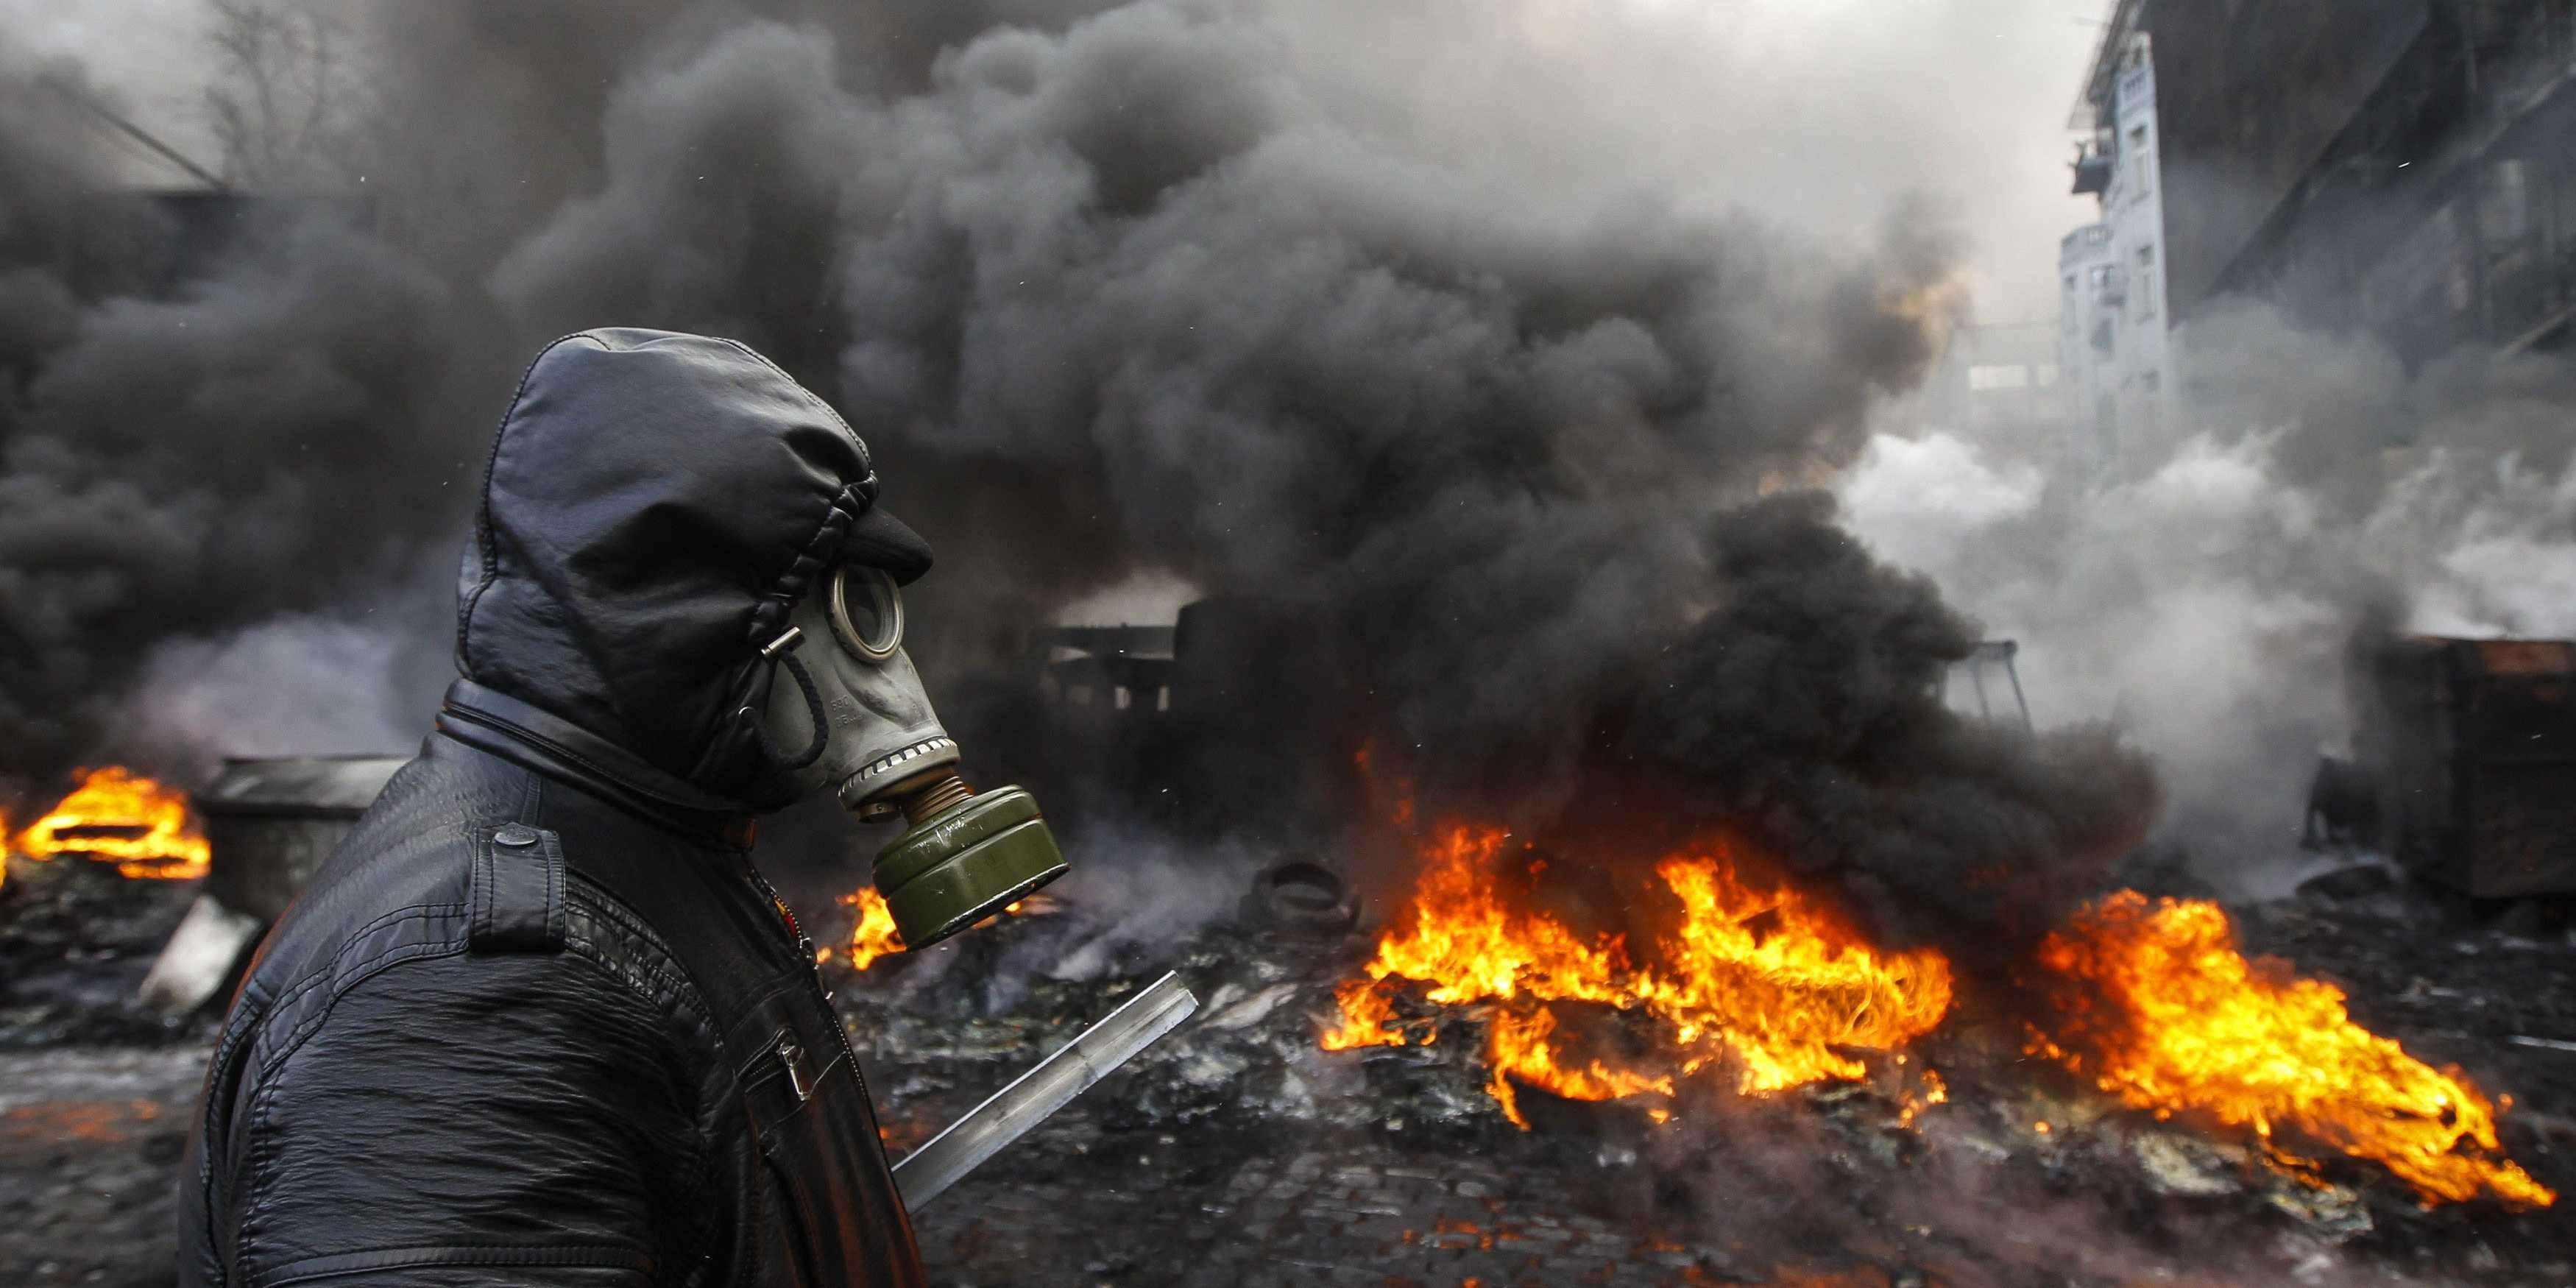 Crisi Ucraina, Poroshenko: «Ci sono stati progressi». Putin frena: «A Minsk solo a certe condizioni»